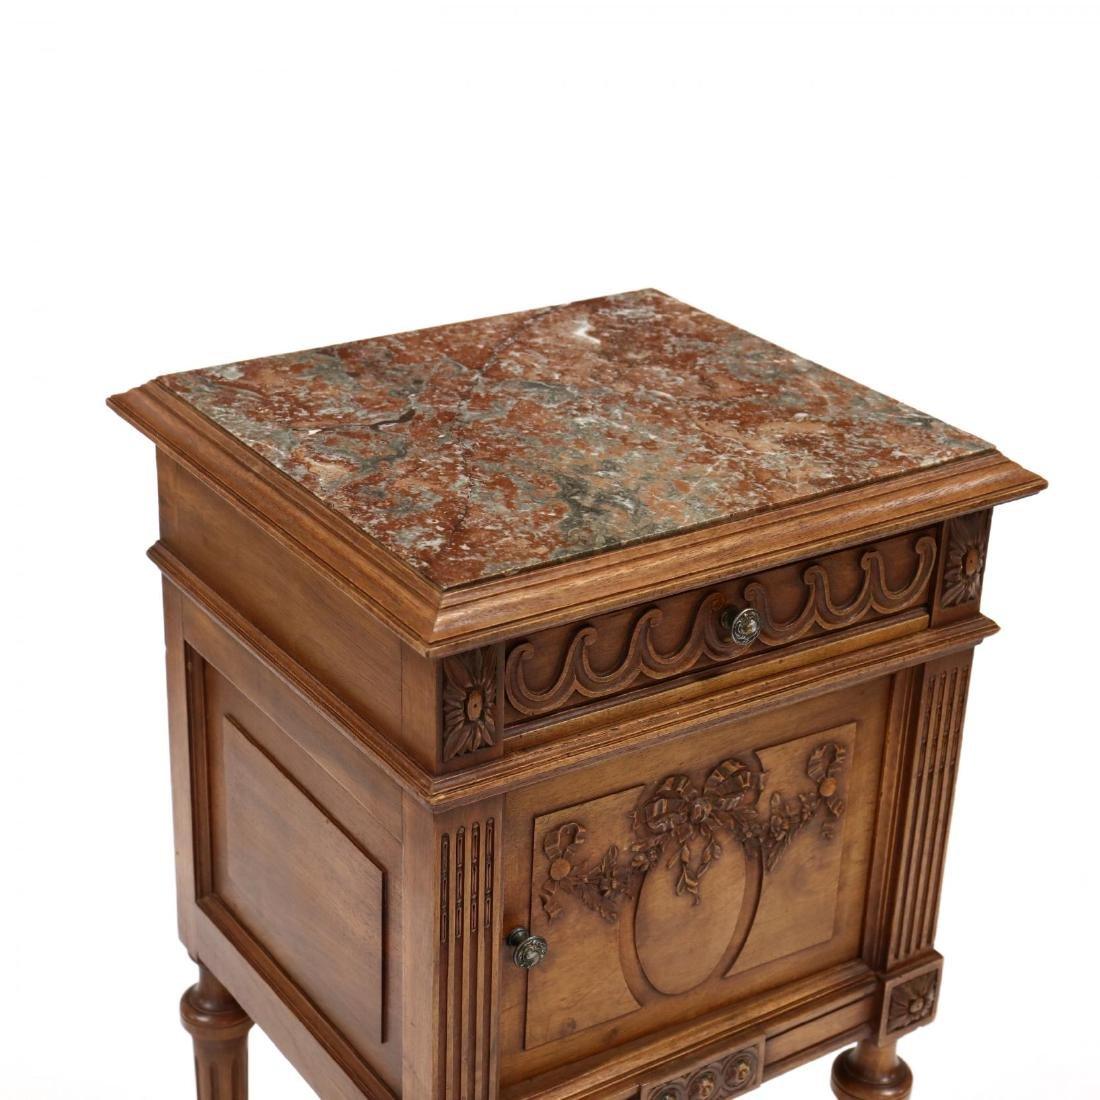 Louis XVI Style Marble Top Smoking Stand - 2